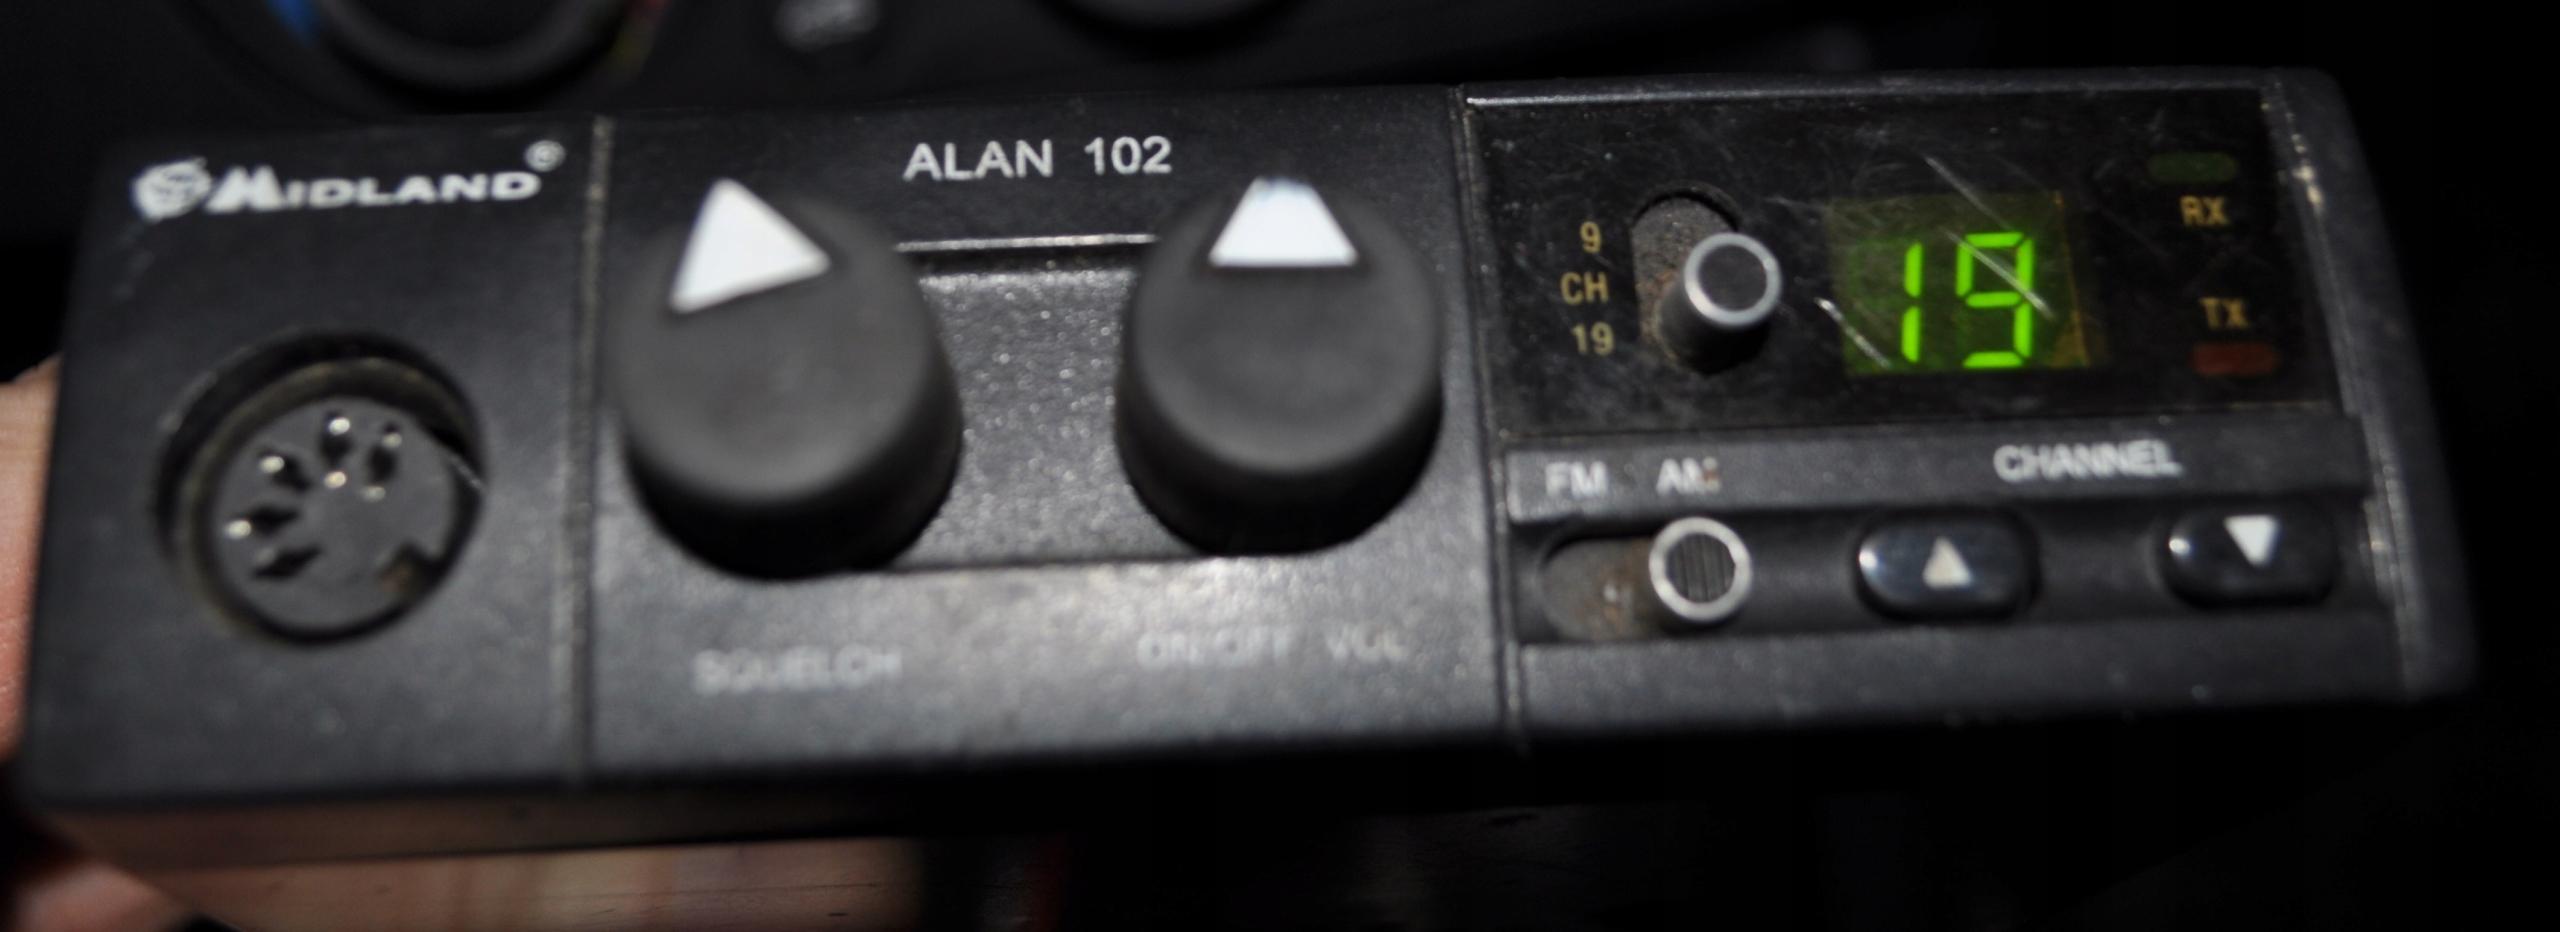 CB Radio Midland Alan 102 gruszka antena Hustler